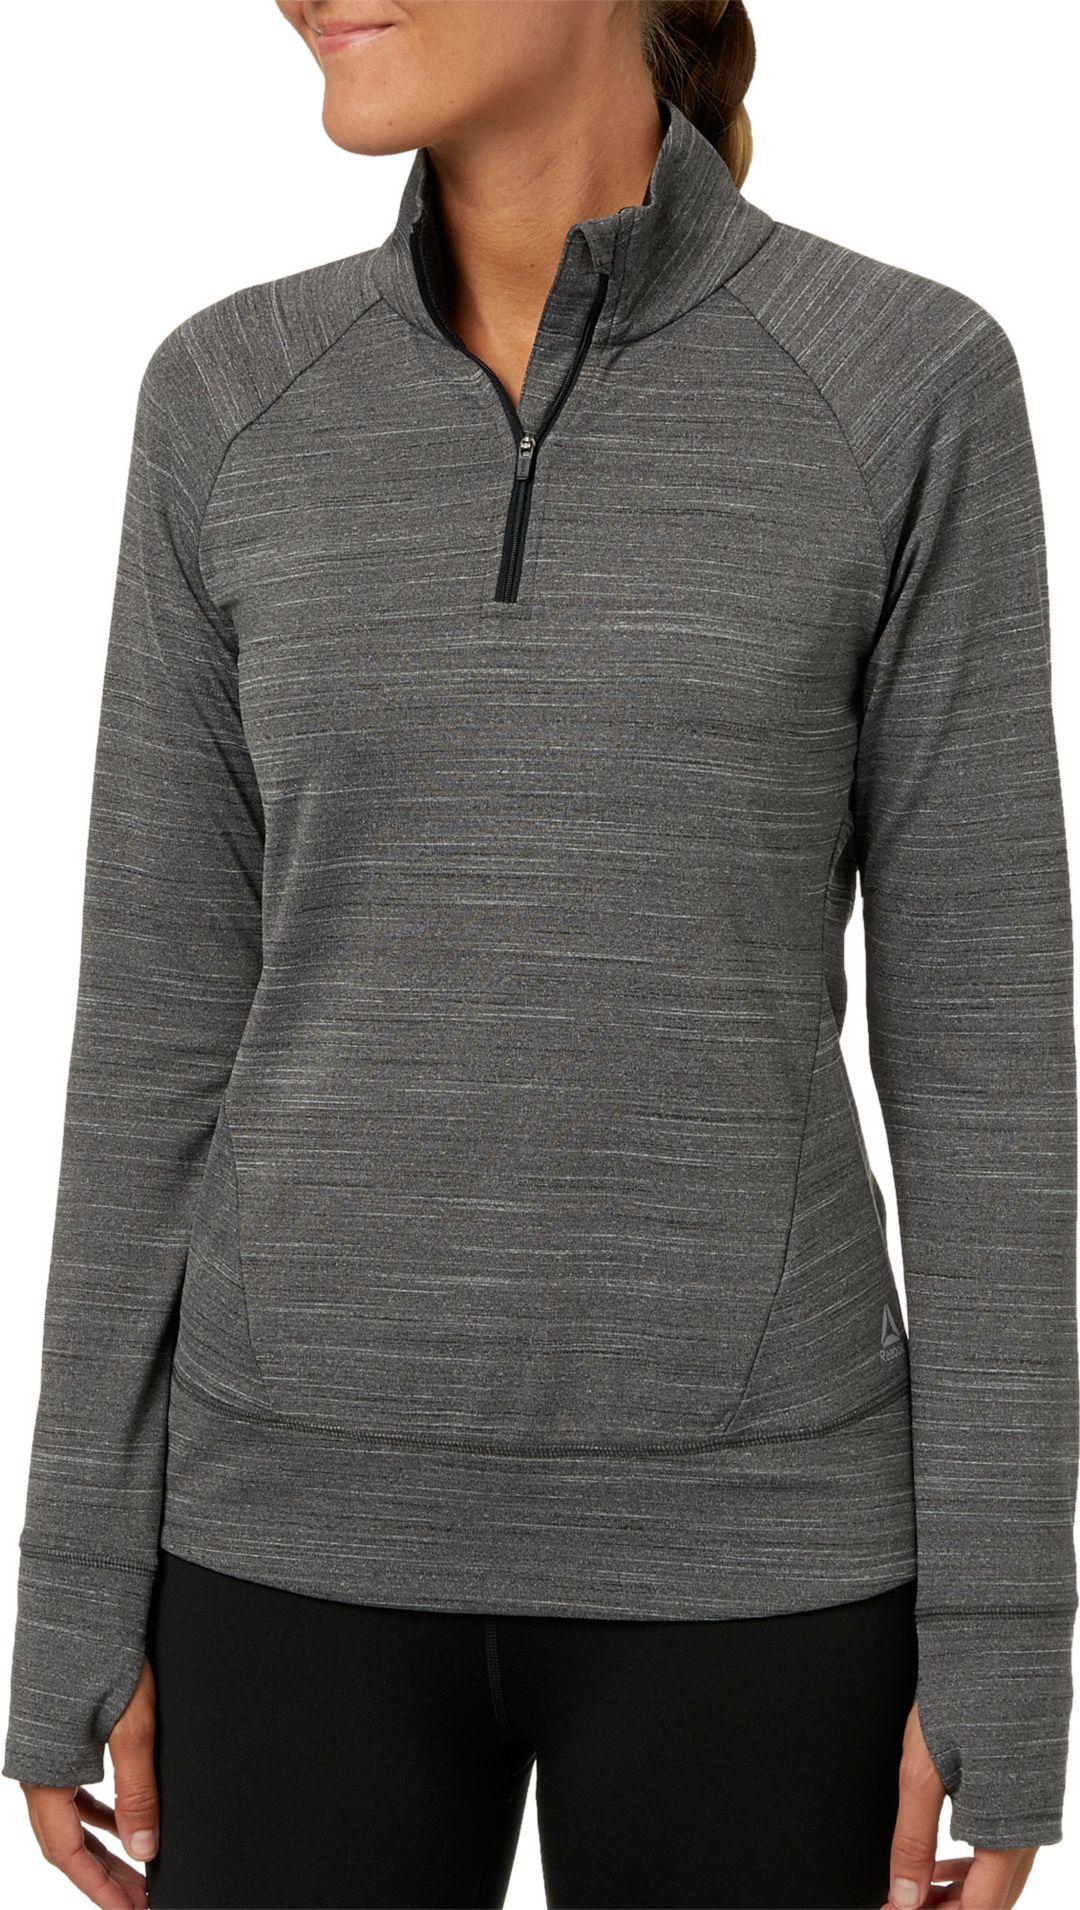 2cc61afae1e Reebok Women's Cold Weather Compression 1/4 Zip Long Sleeve Shirt